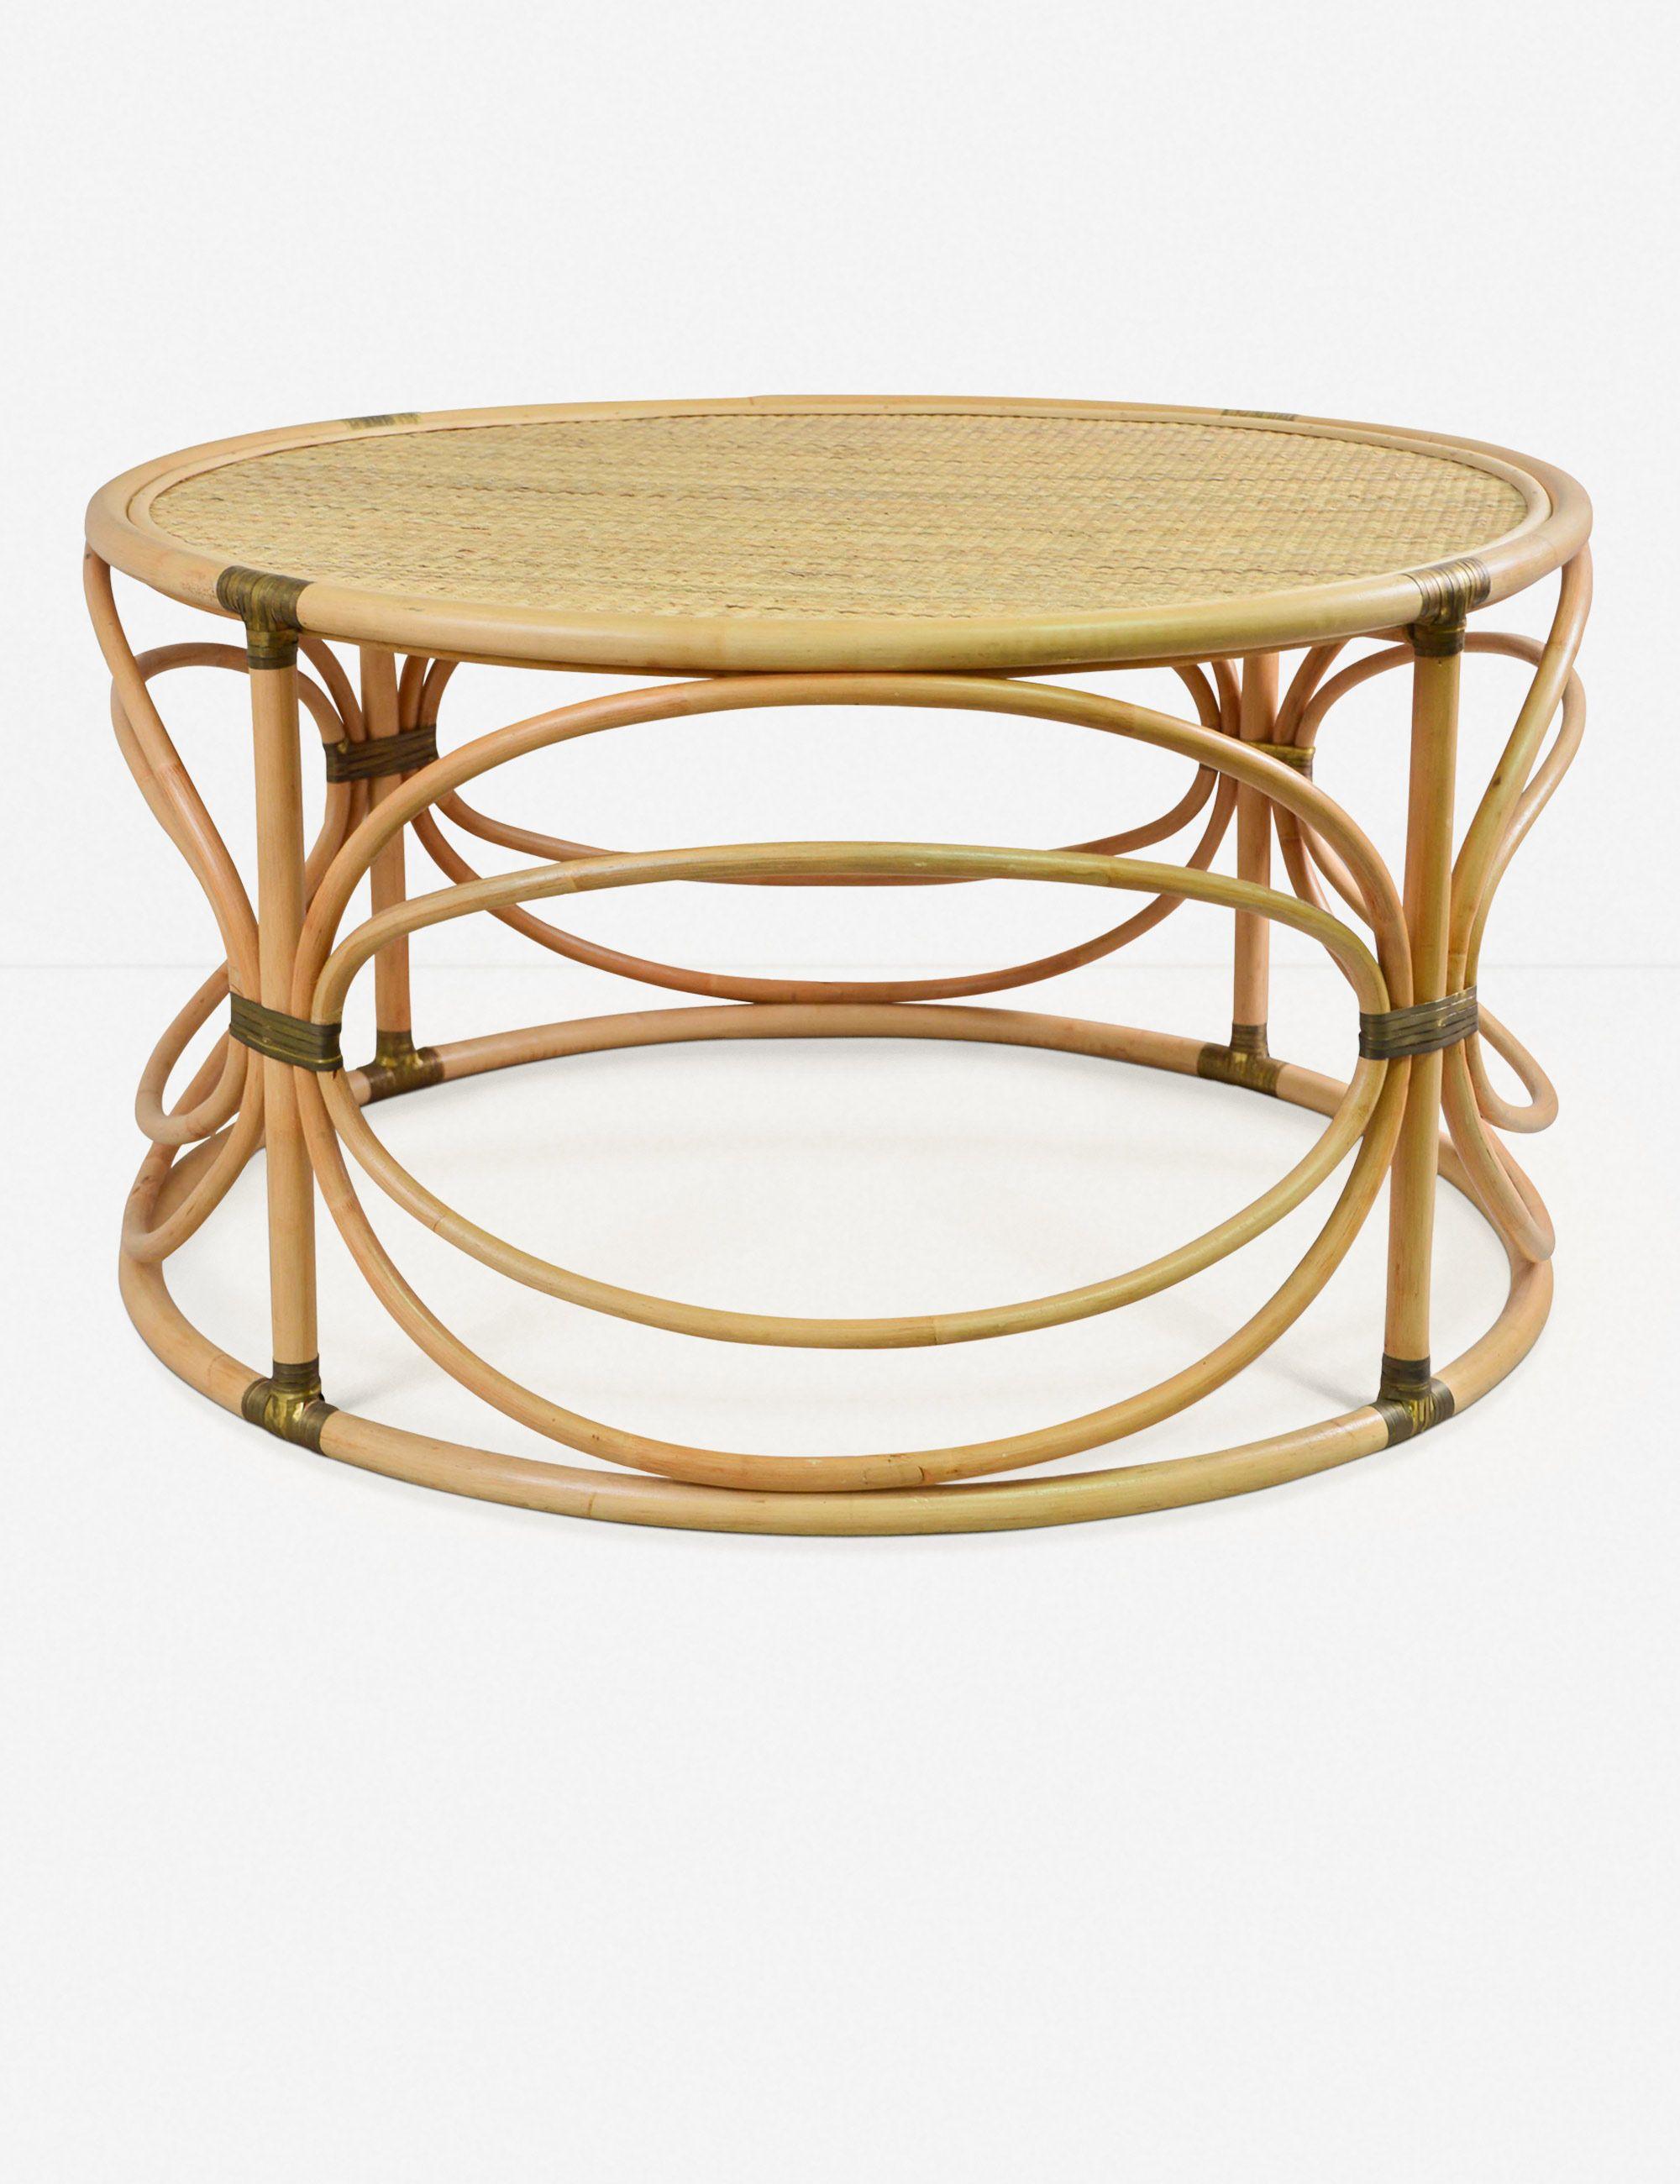 Corrine Round Coffee Table Coffee Table Coffee Table Wood Rattan Coffee Table [ 2600 x 2000 Pixel ]